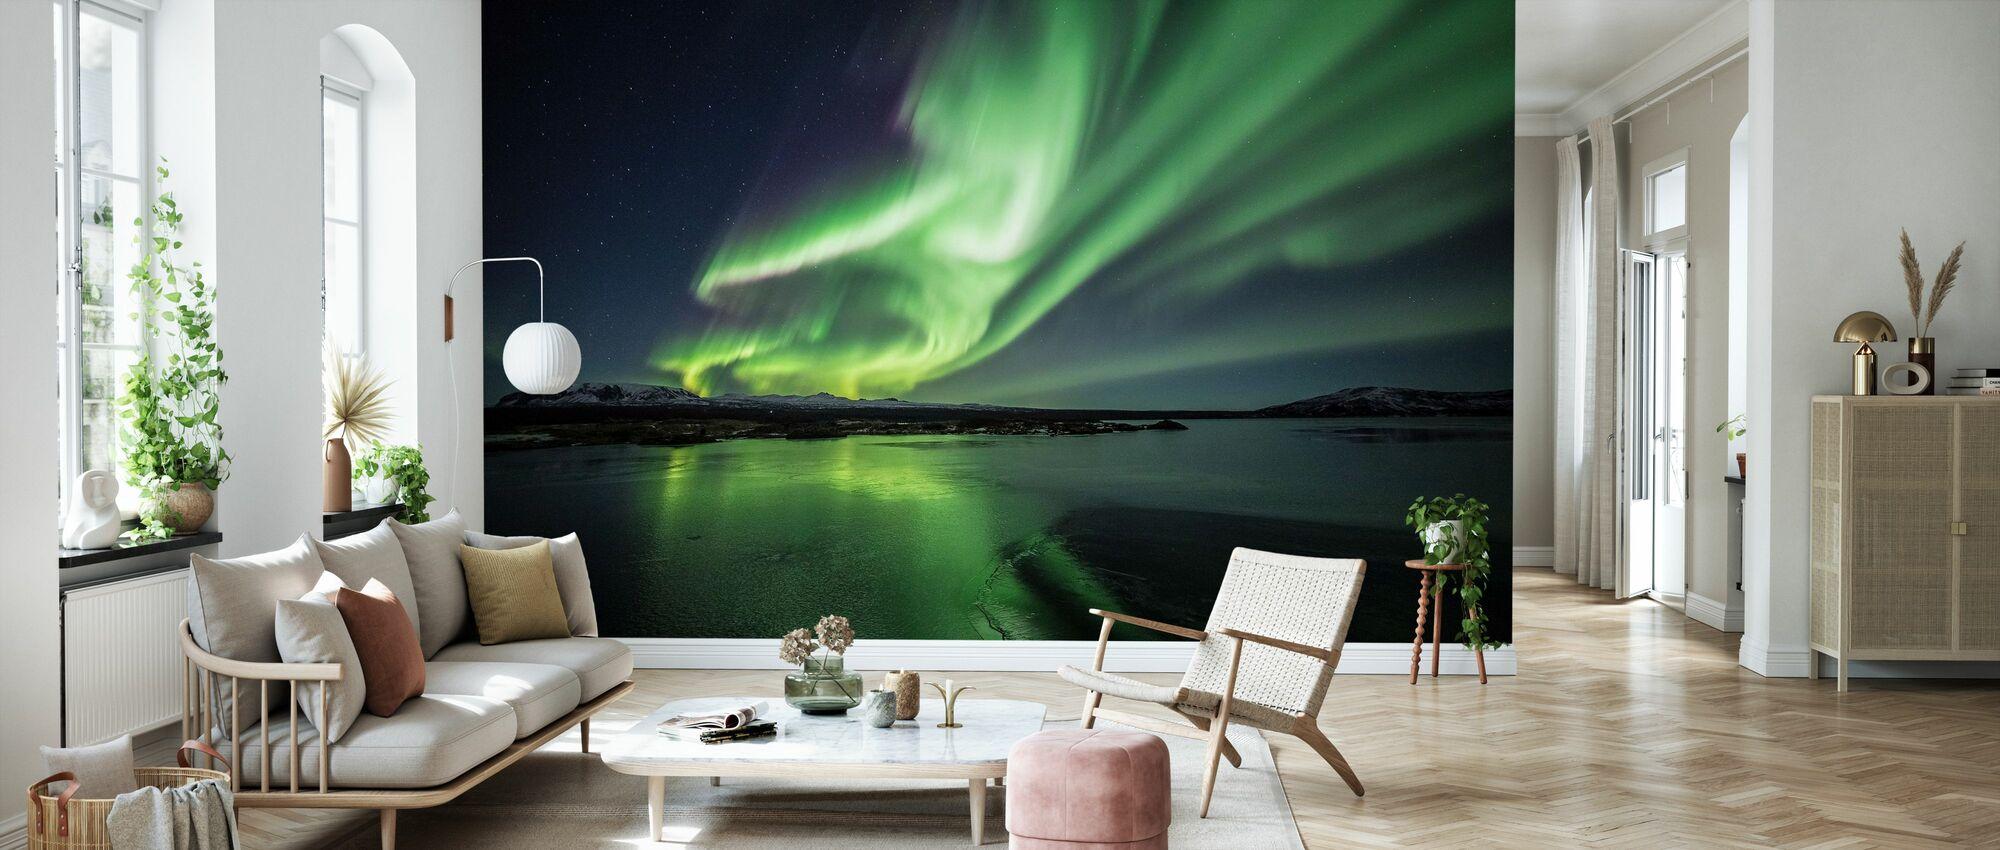 Lumoava Aurora Borealis - Tapetti - Olohuone